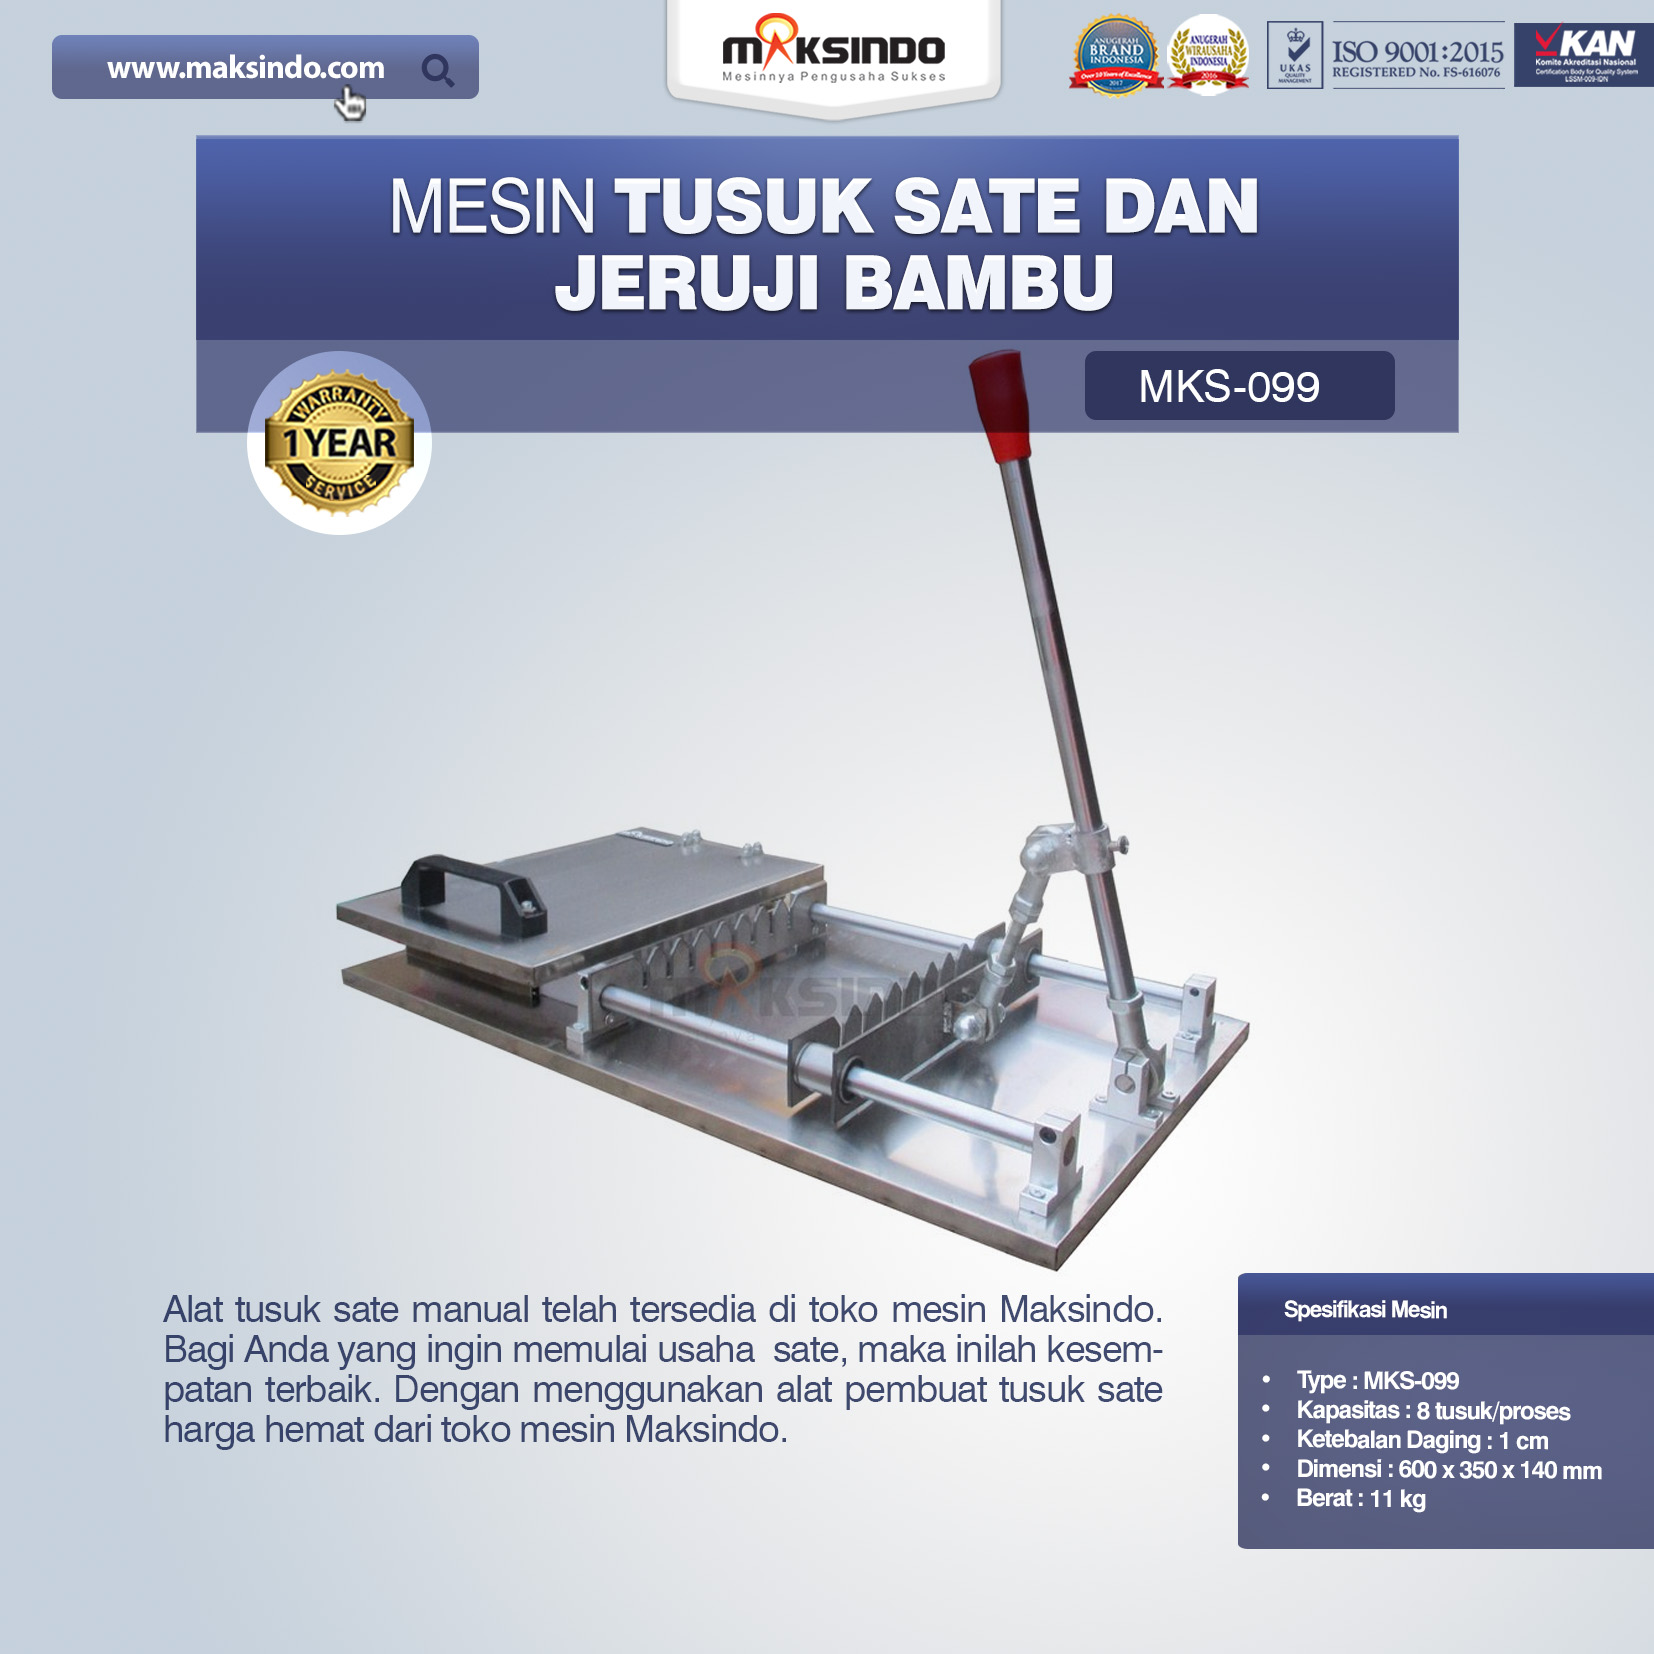 Mesin-Tusuk-Sate-dan-Jeruji-Bambu-MKS-099